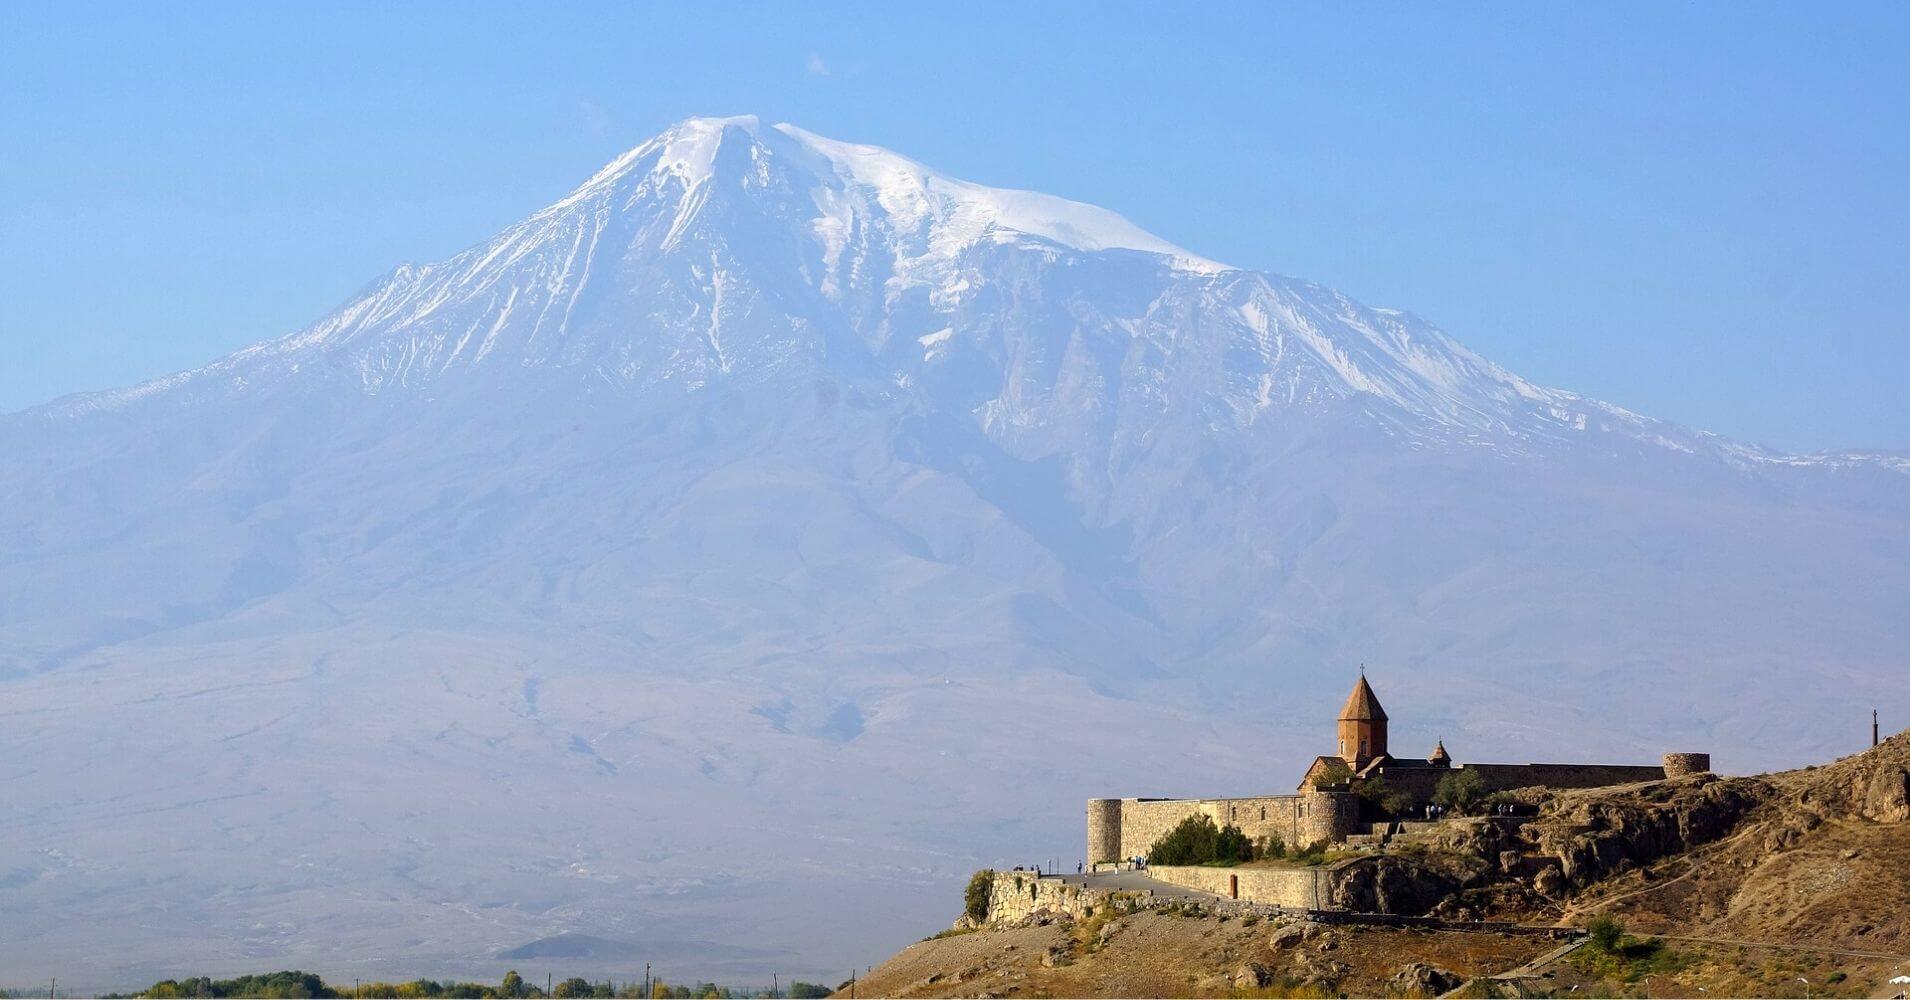 Monasterio Khor Virap. Ararat. Armenia.